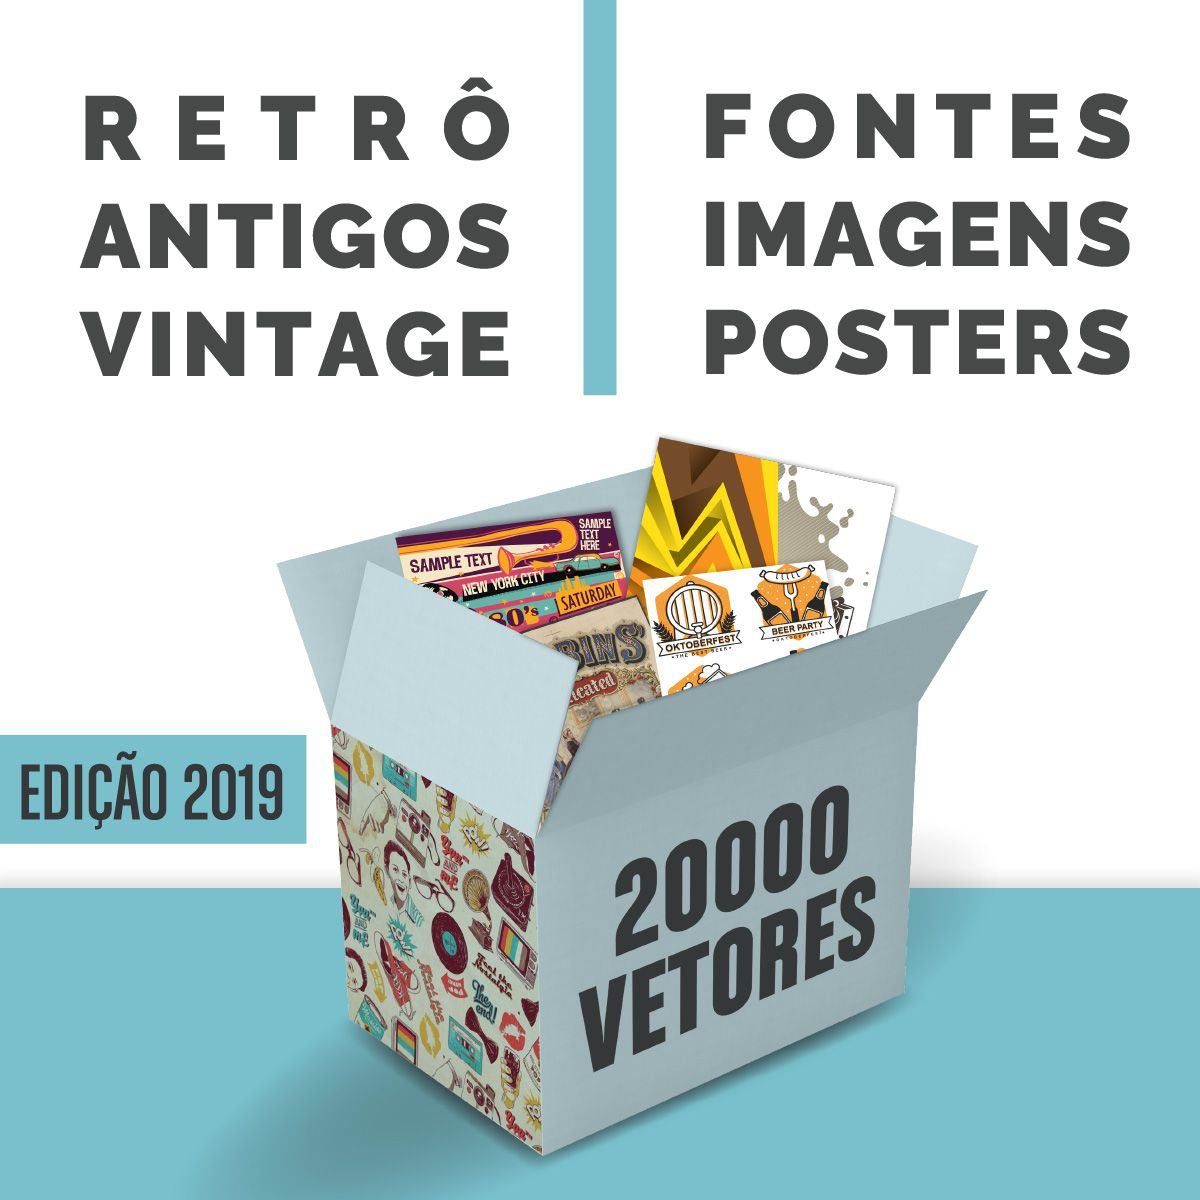 20.000 Vetores Retrô Antigos Vintage Fontes Imagens Posters